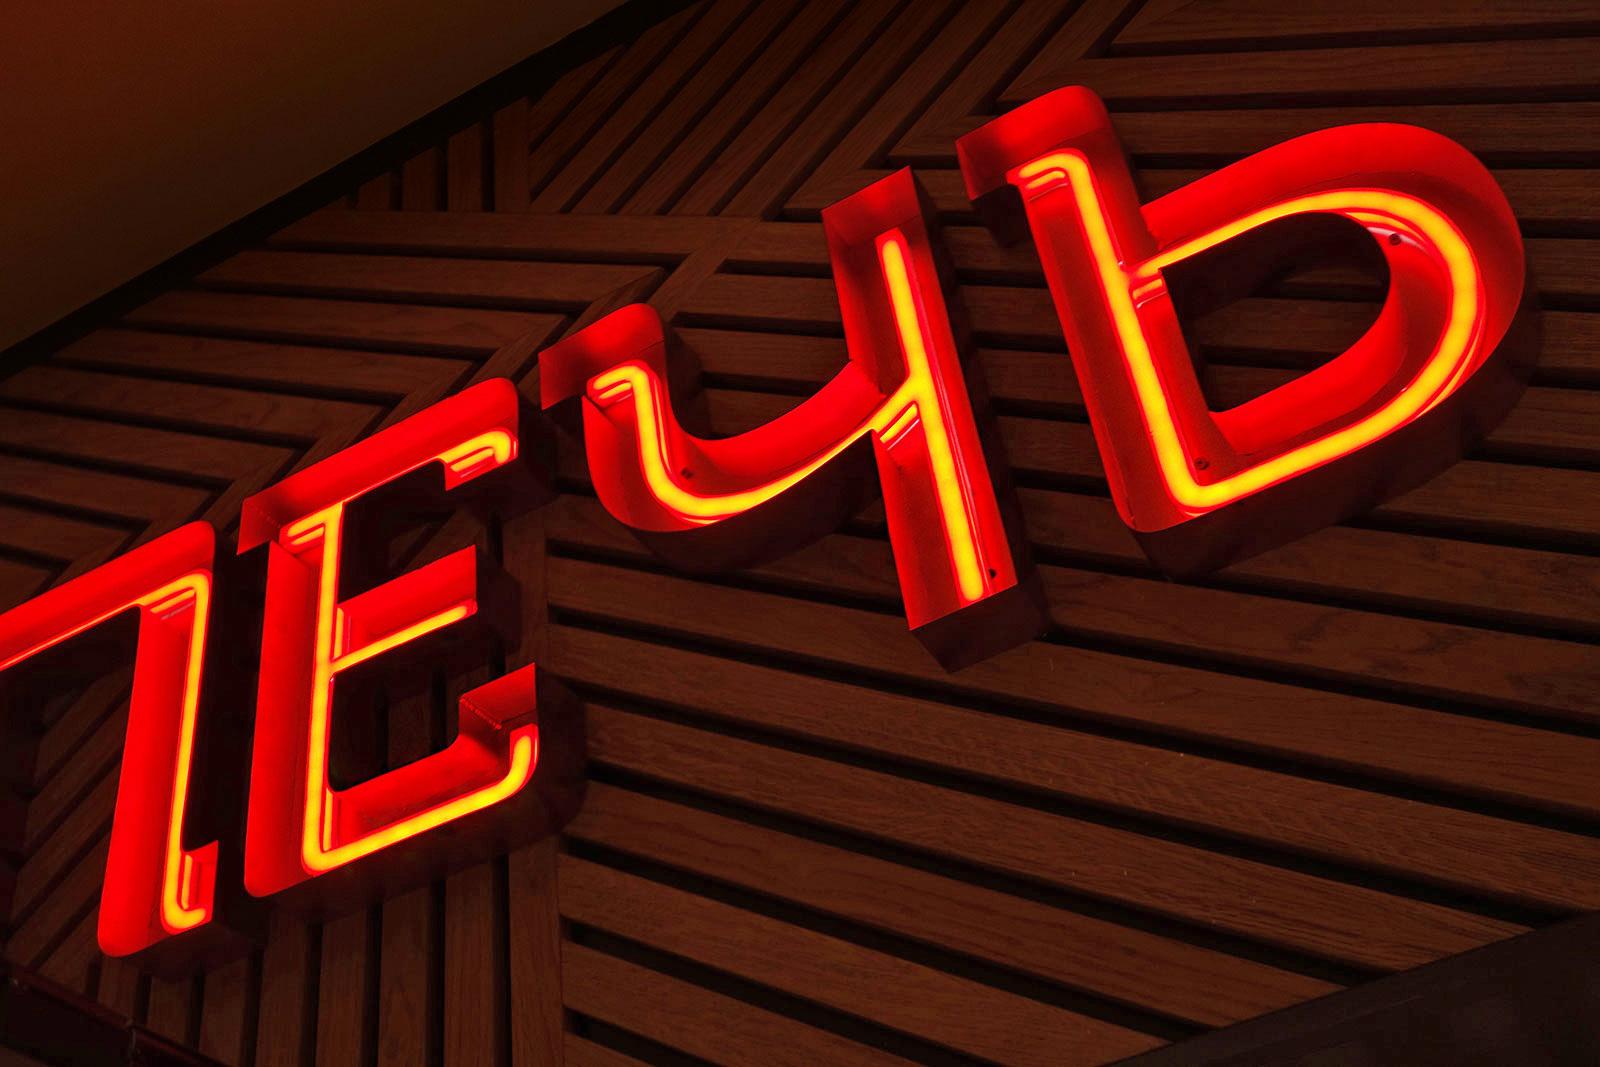 ASGARD, Market place, Restaurant identity, Design, singsystem